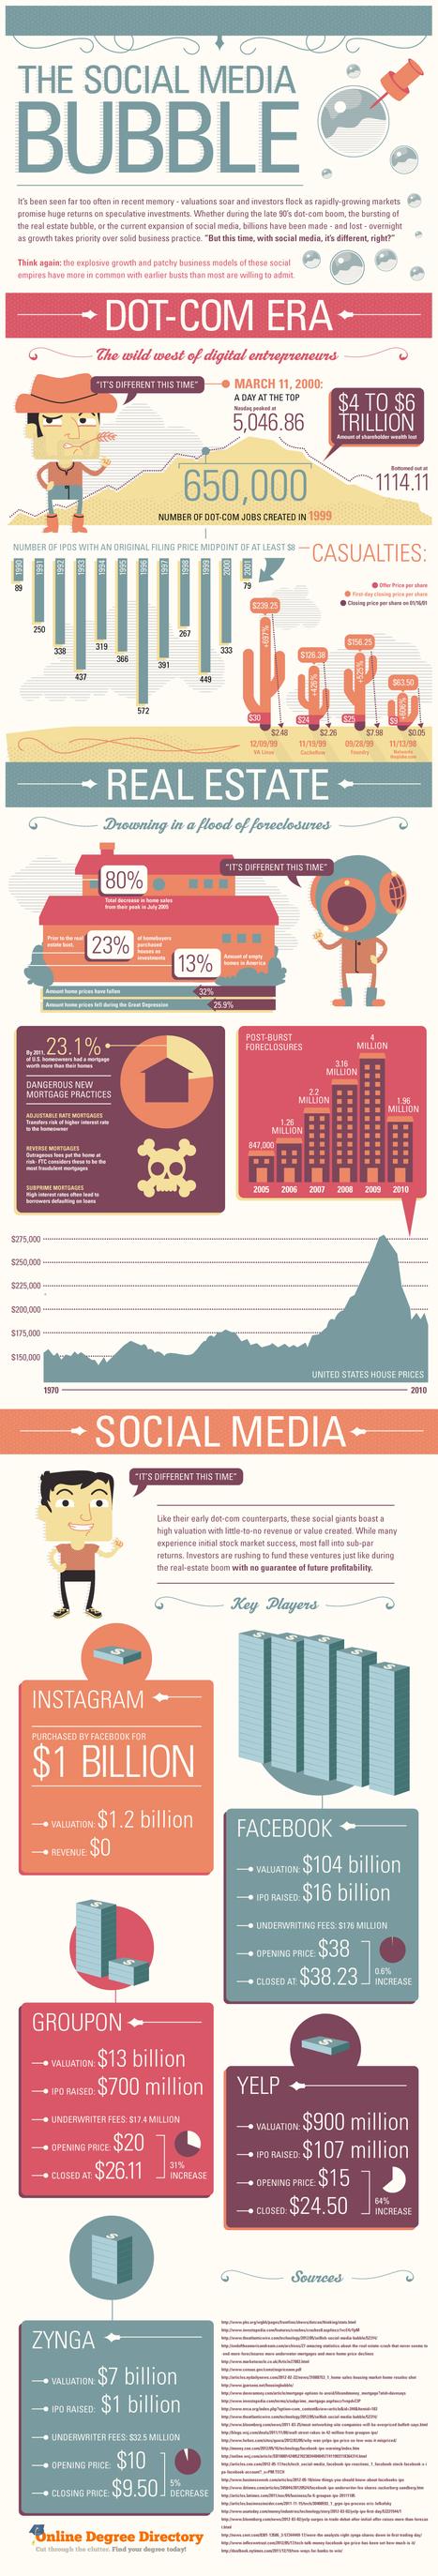 The Social Media Bubble [Infographic] | ten Hagen on Social Media | Scoop.it